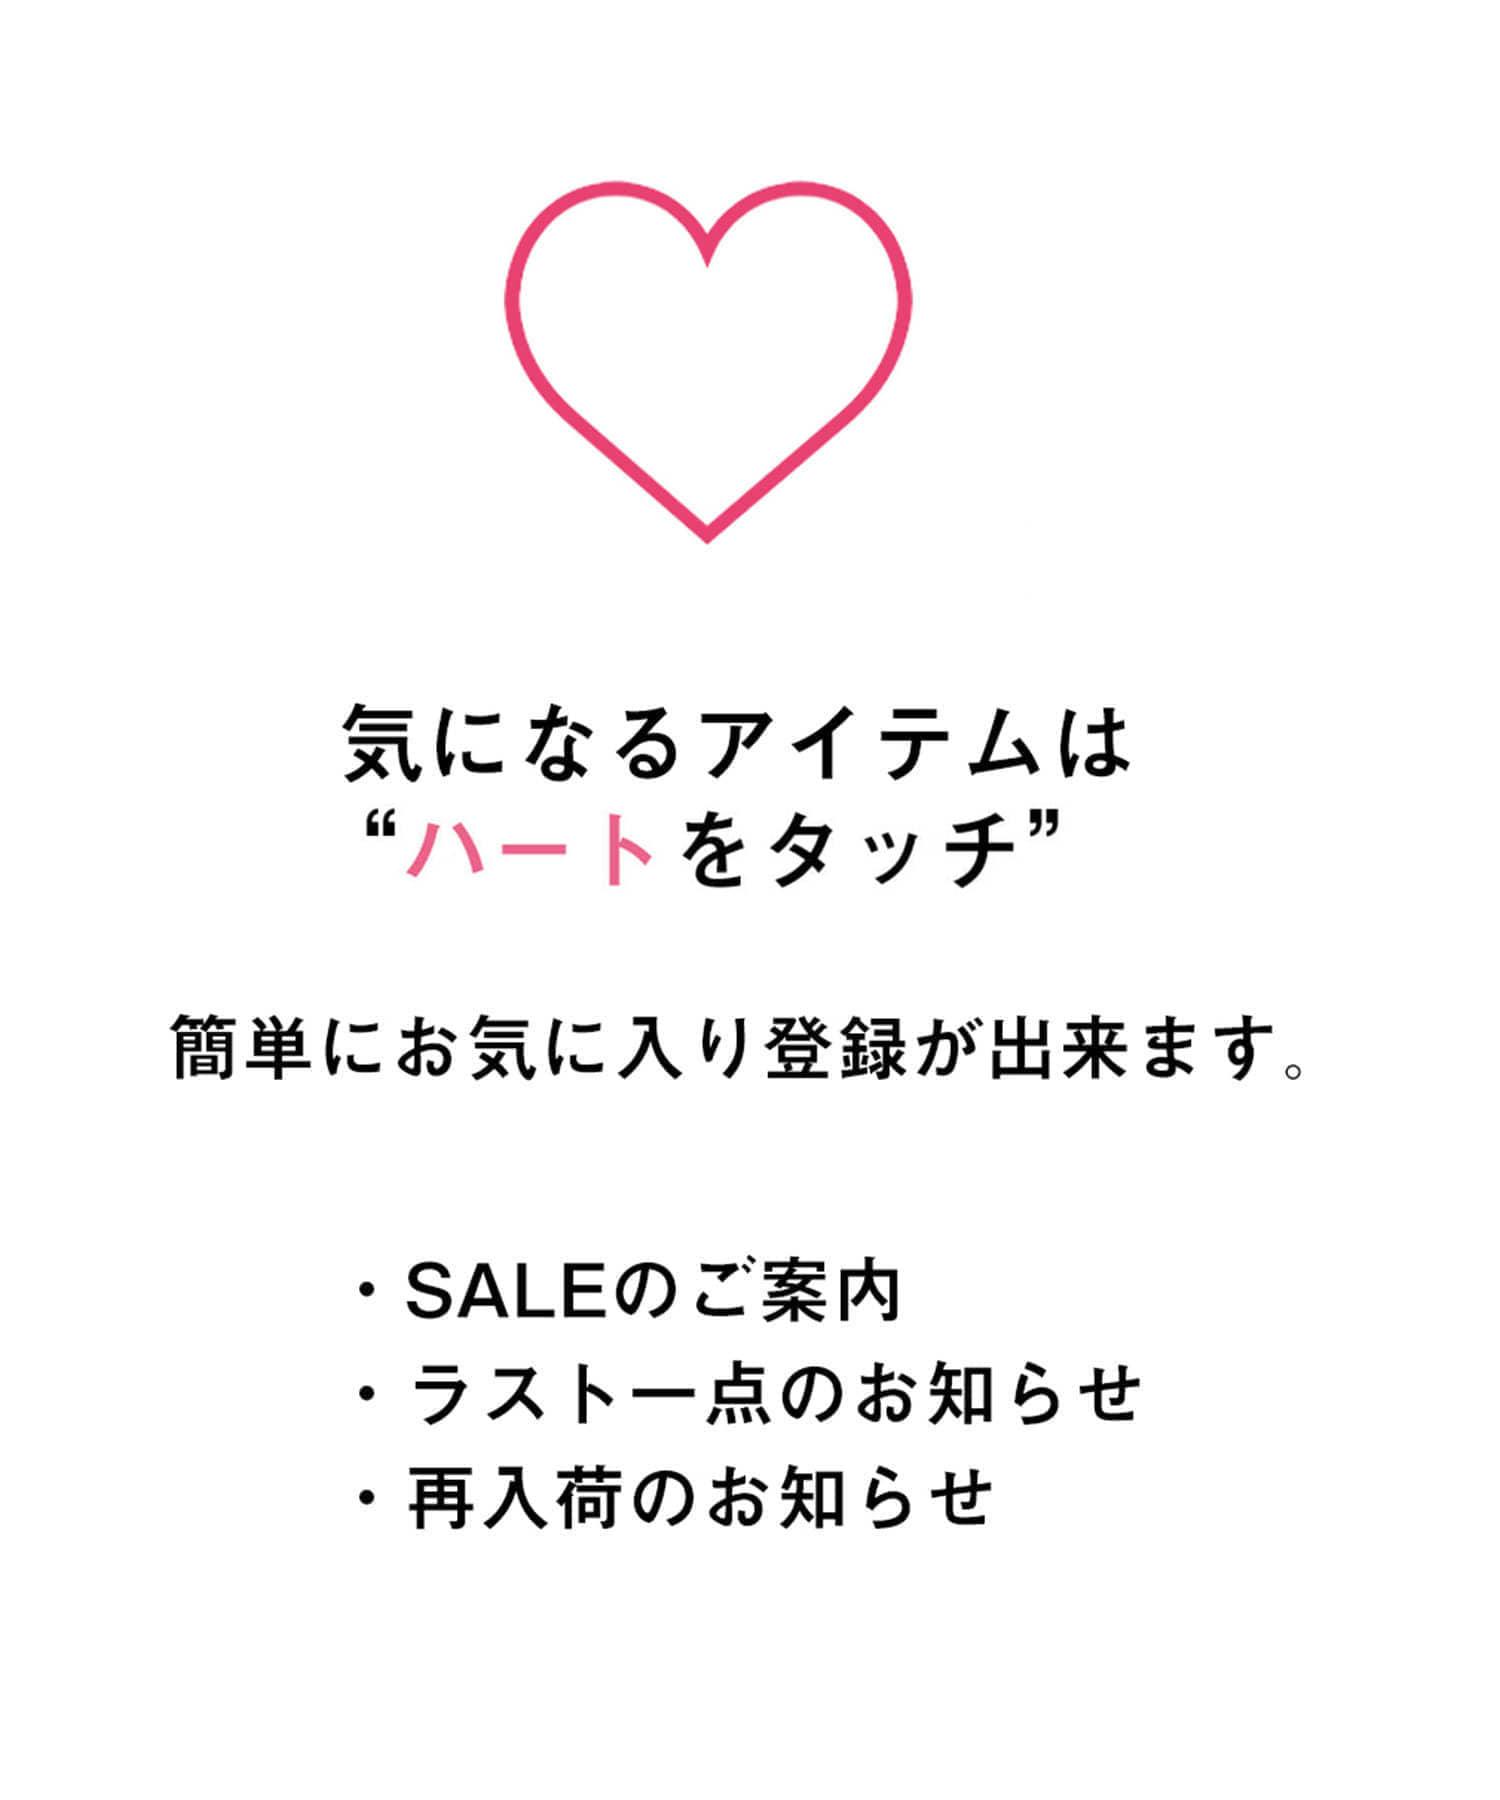 BONbazaar(ボンバザール) 【廣田硝子】昭和モダン珈琲 耐熱性カップ クリア